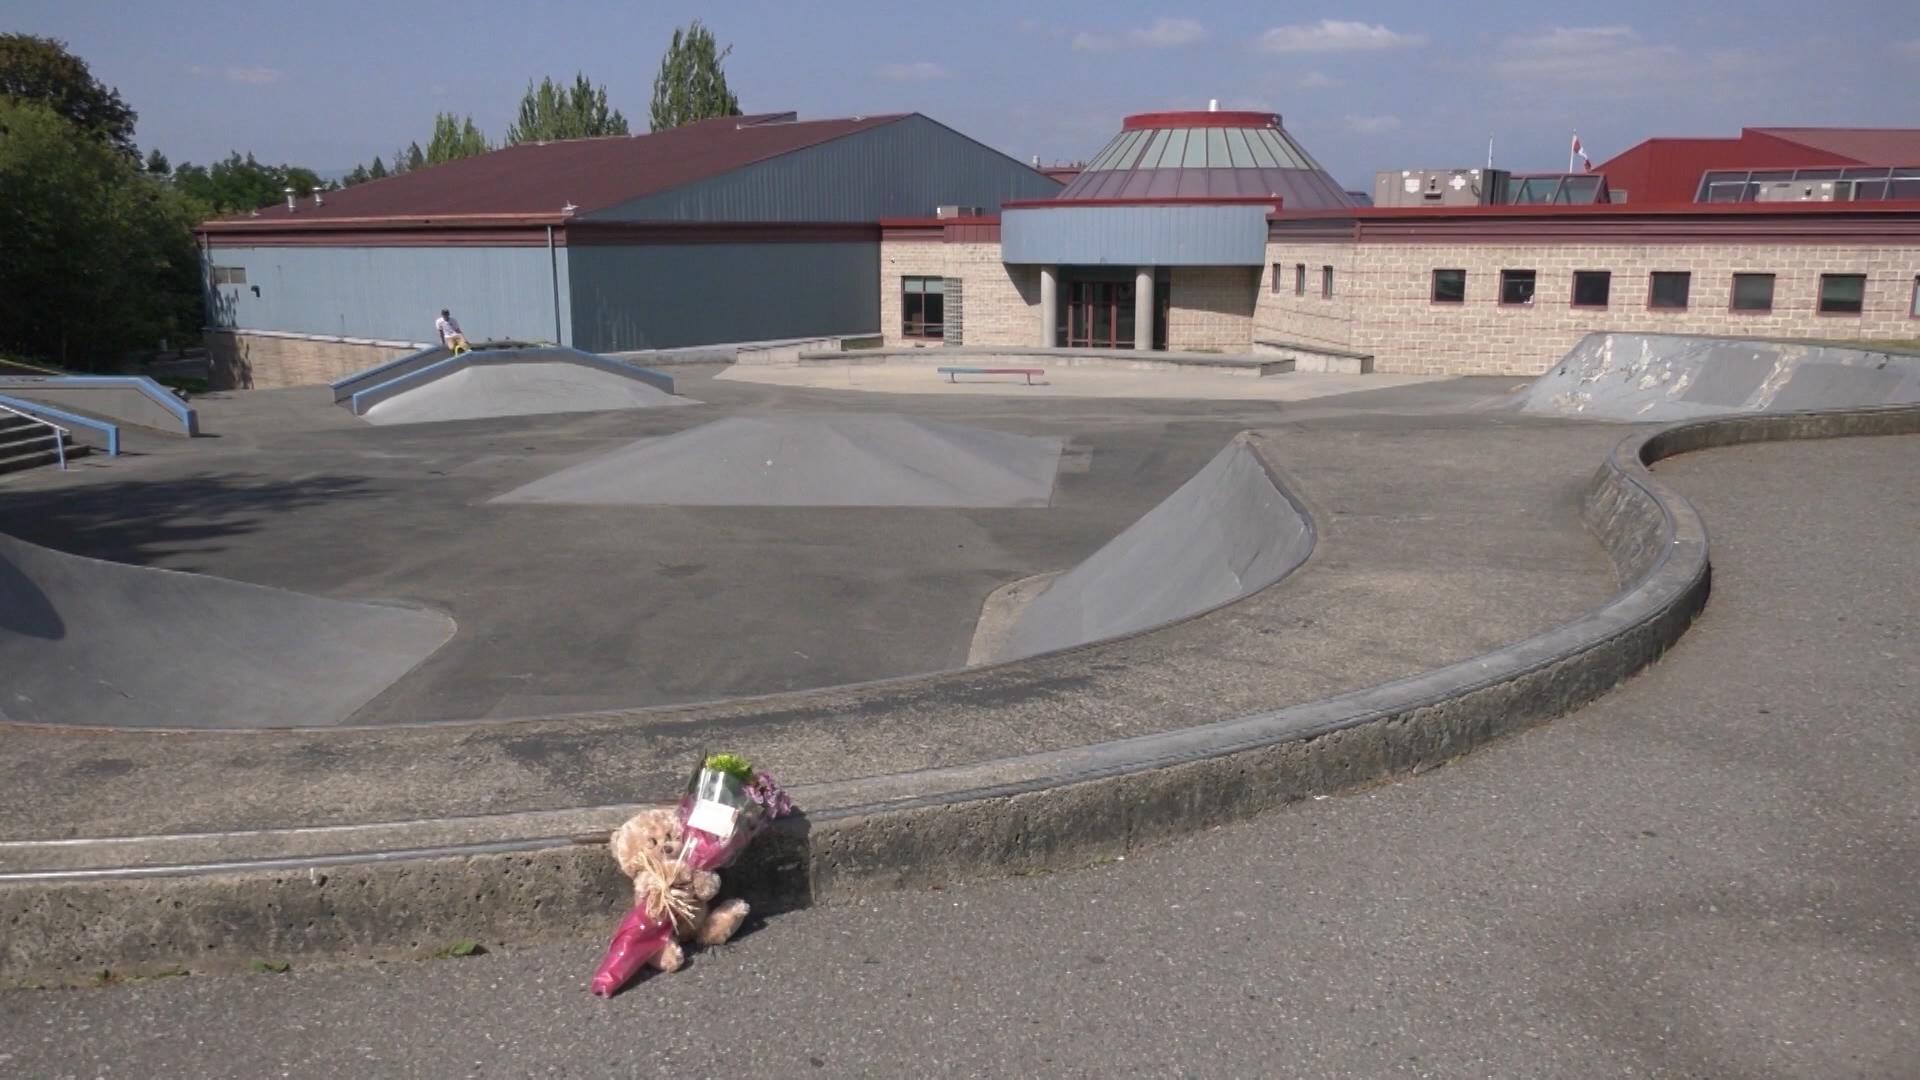 Death of teen found near Langley, B C  skate park believed